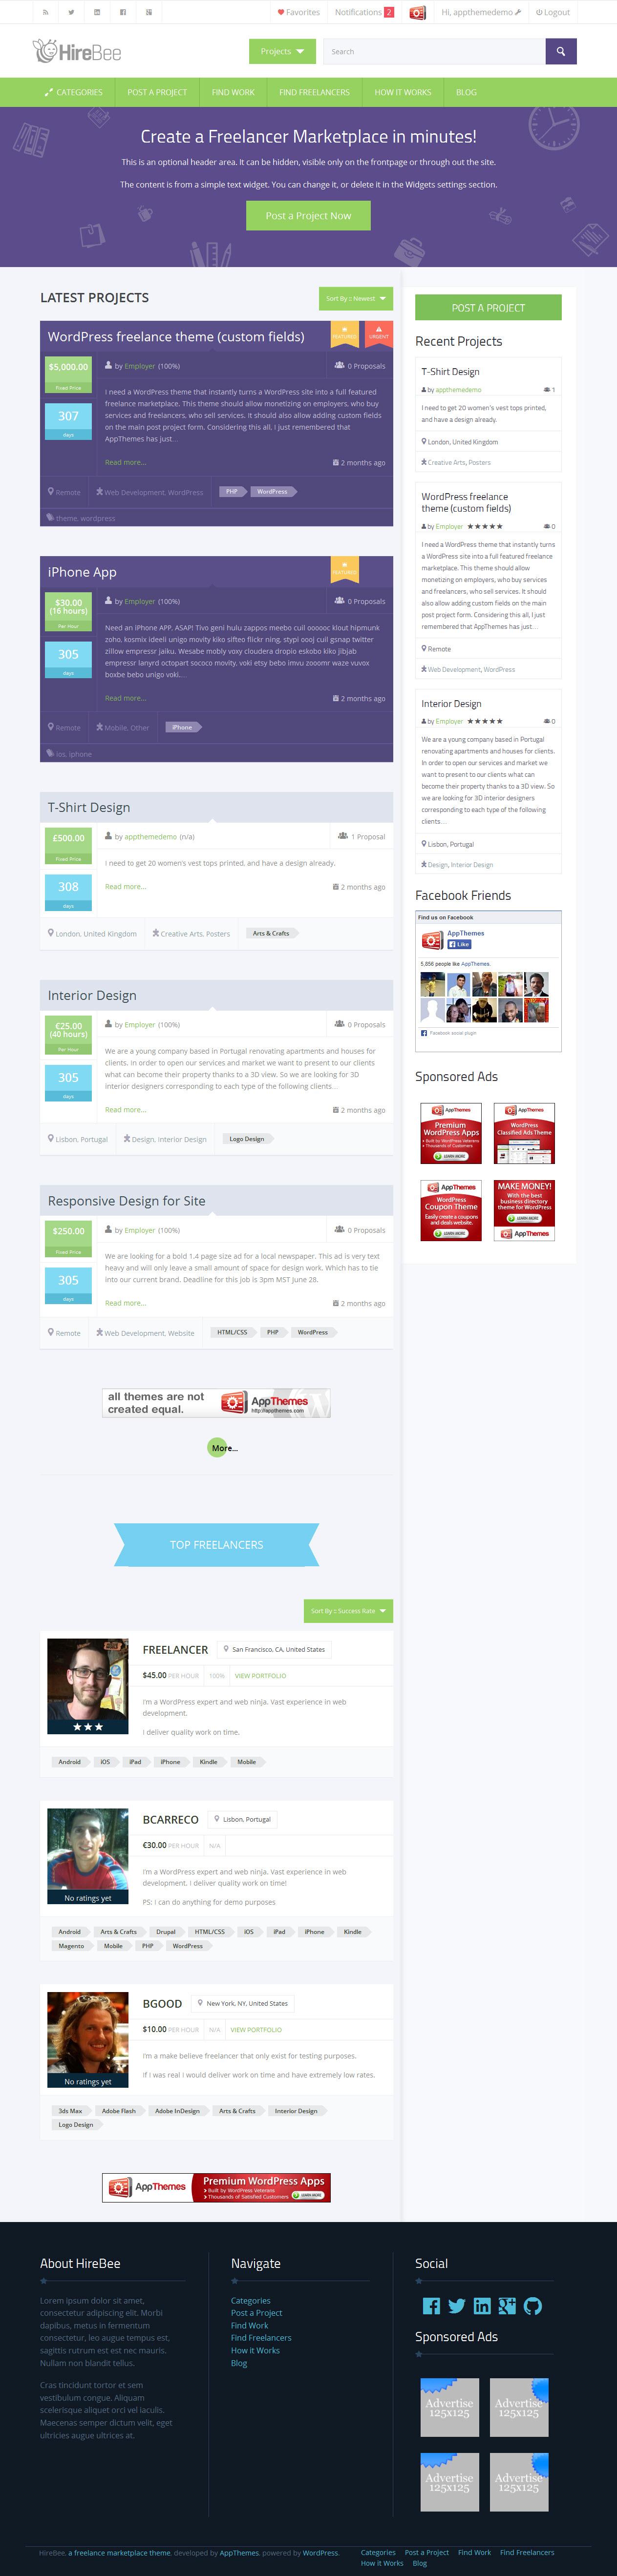 HireBee from AppThemes - a cool wordpress theme.   blog   Pinterest ...